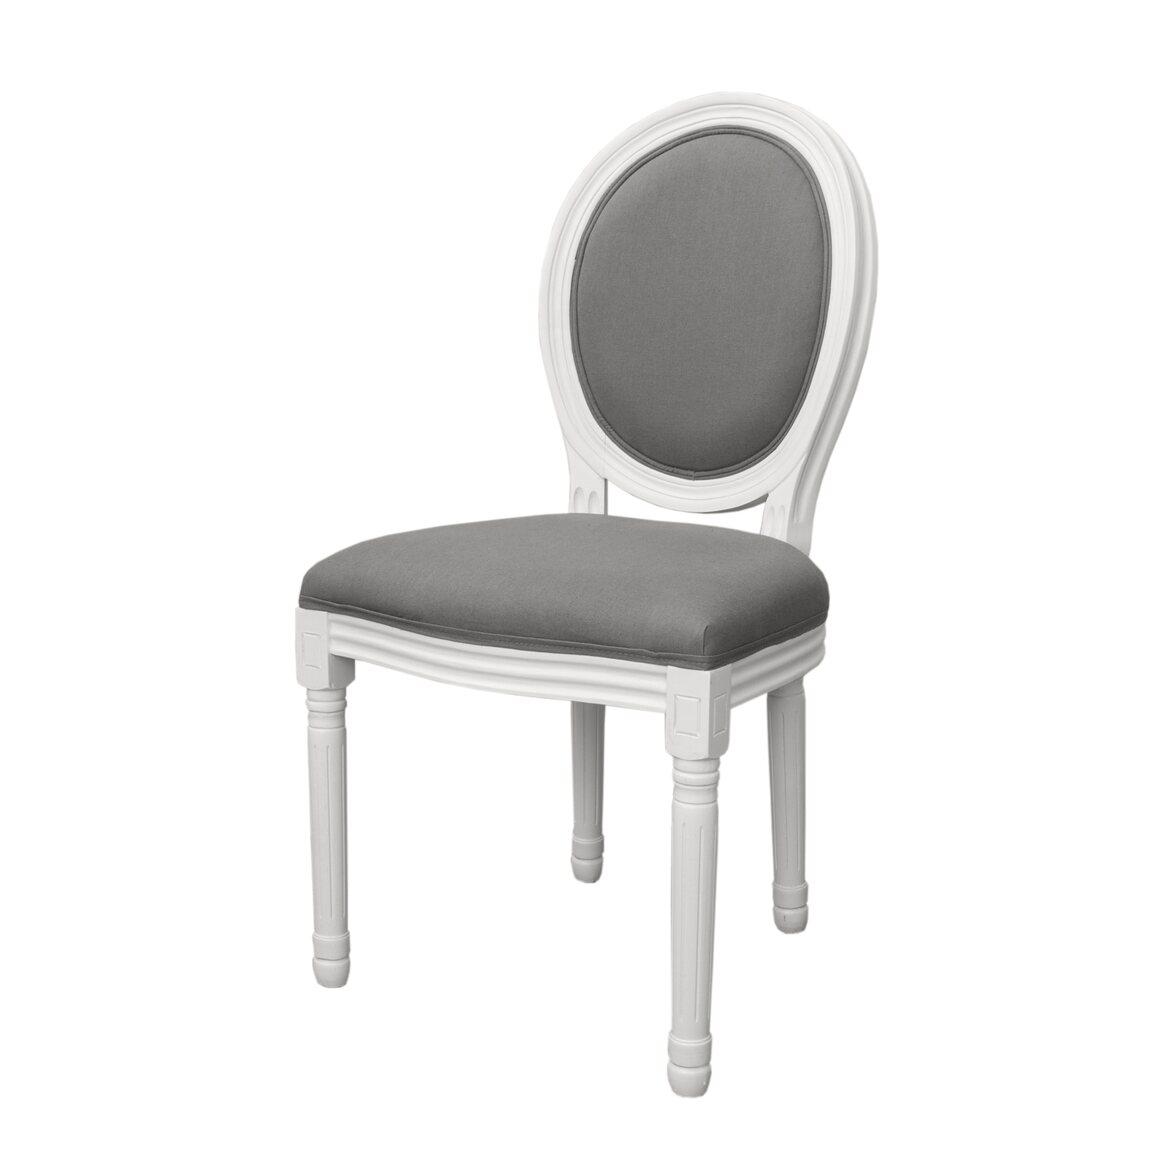 Стул Volker grey+white 4 | Обеденные стулья Kingsby